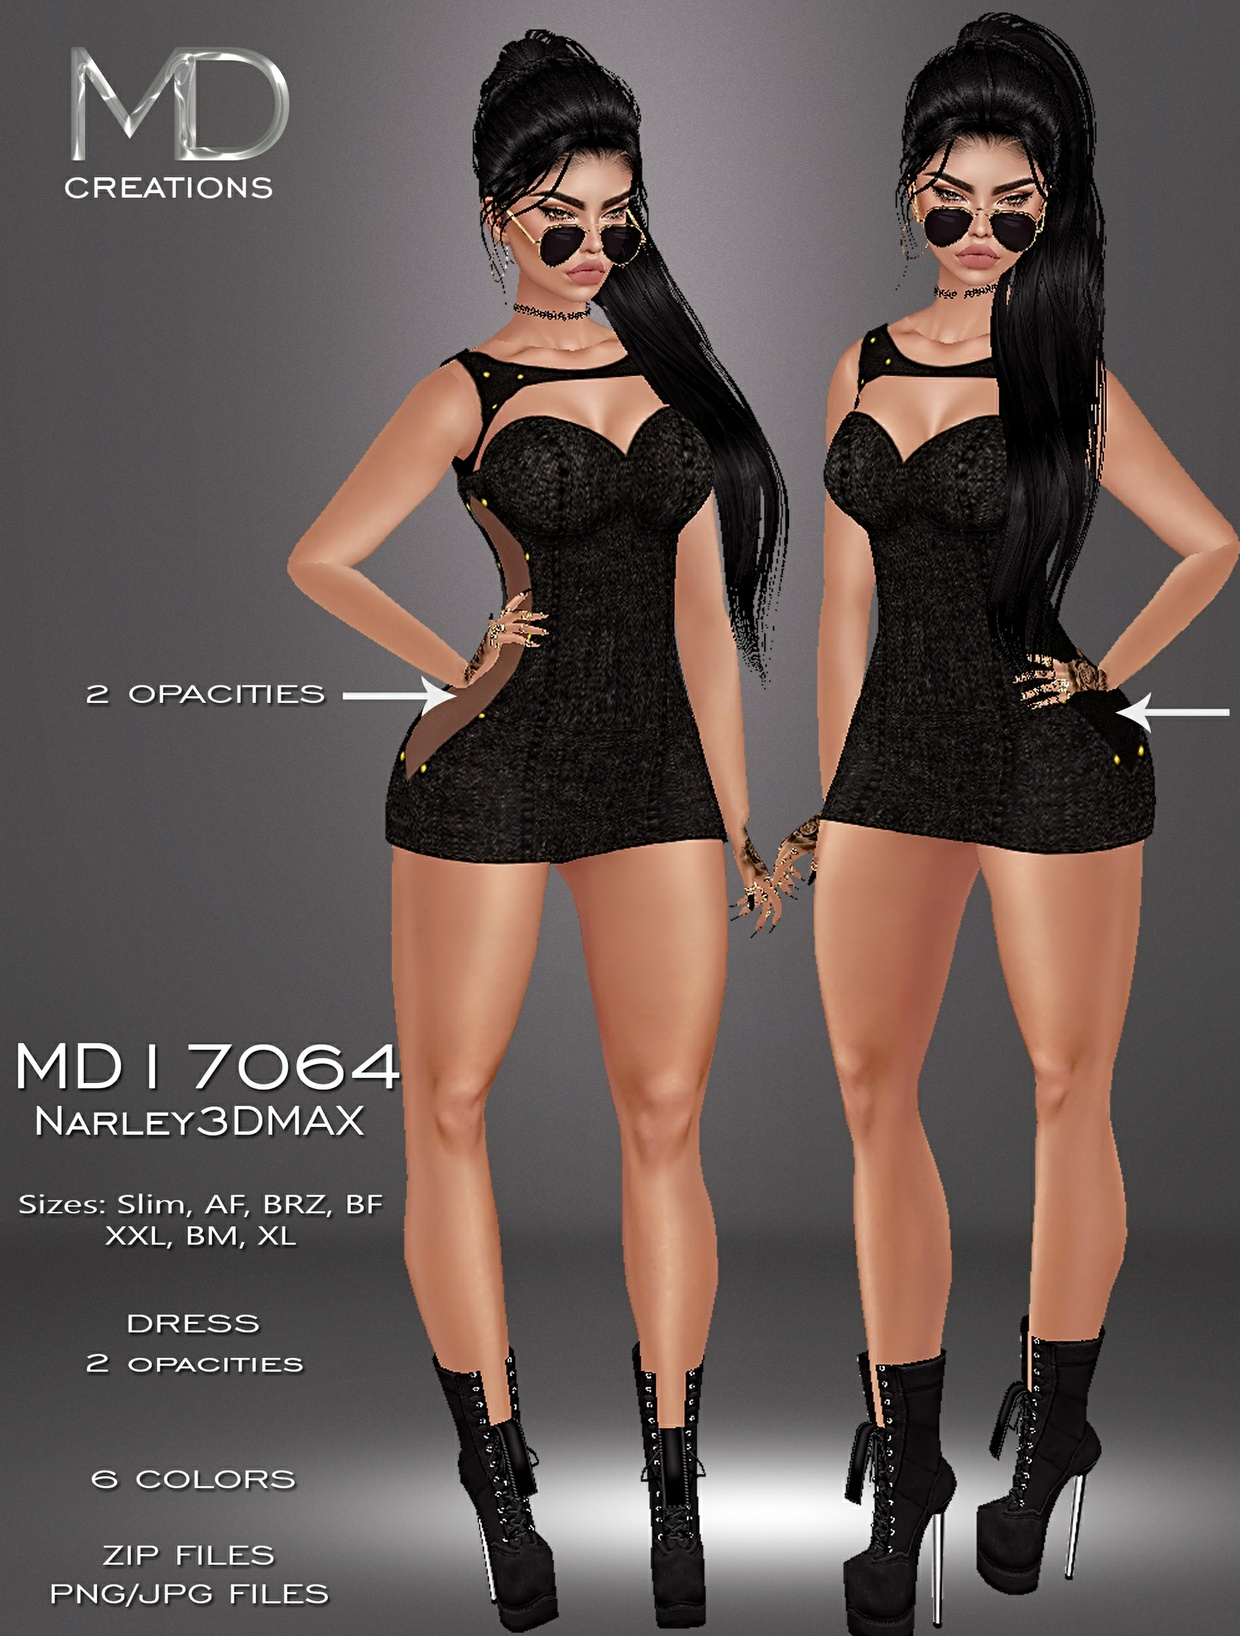 MD17064 - Narley3DMAX